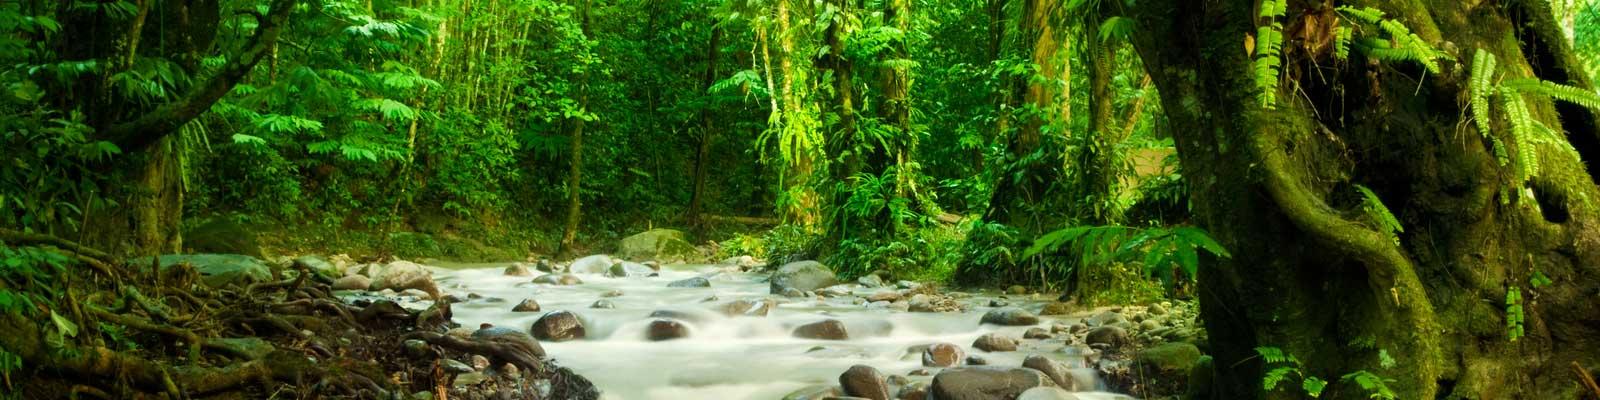 Costa Rica Immobili - Uffici, nuove costruzioni, alberghi - Costruisci, Investi, Affitta